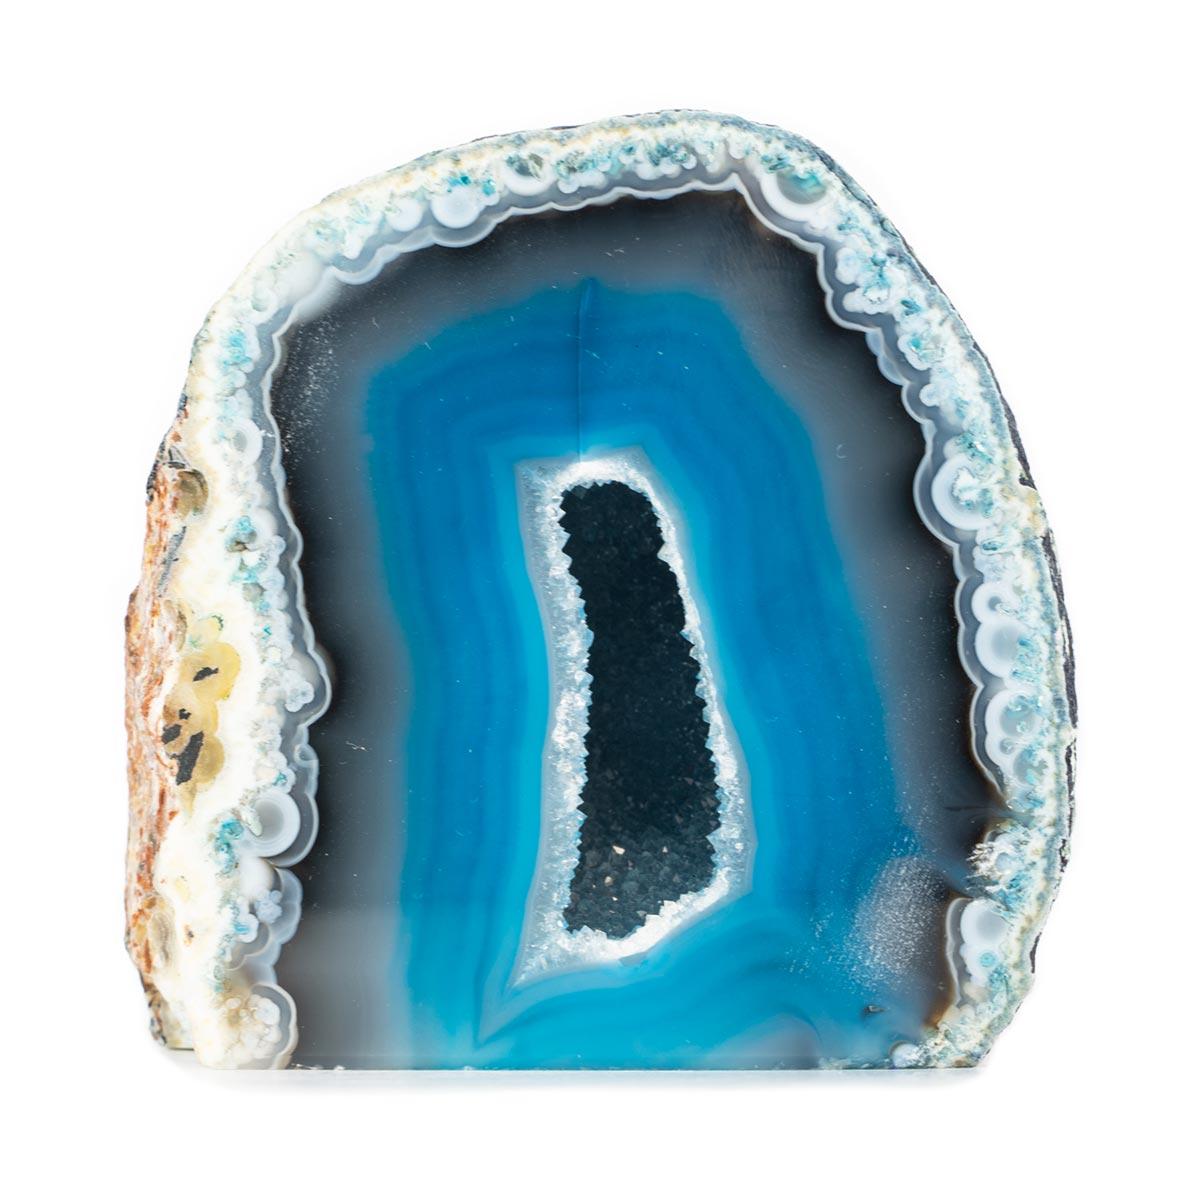 Sri Avinash Infused™ Blue Agate Cave - Love & Compassion Infusion